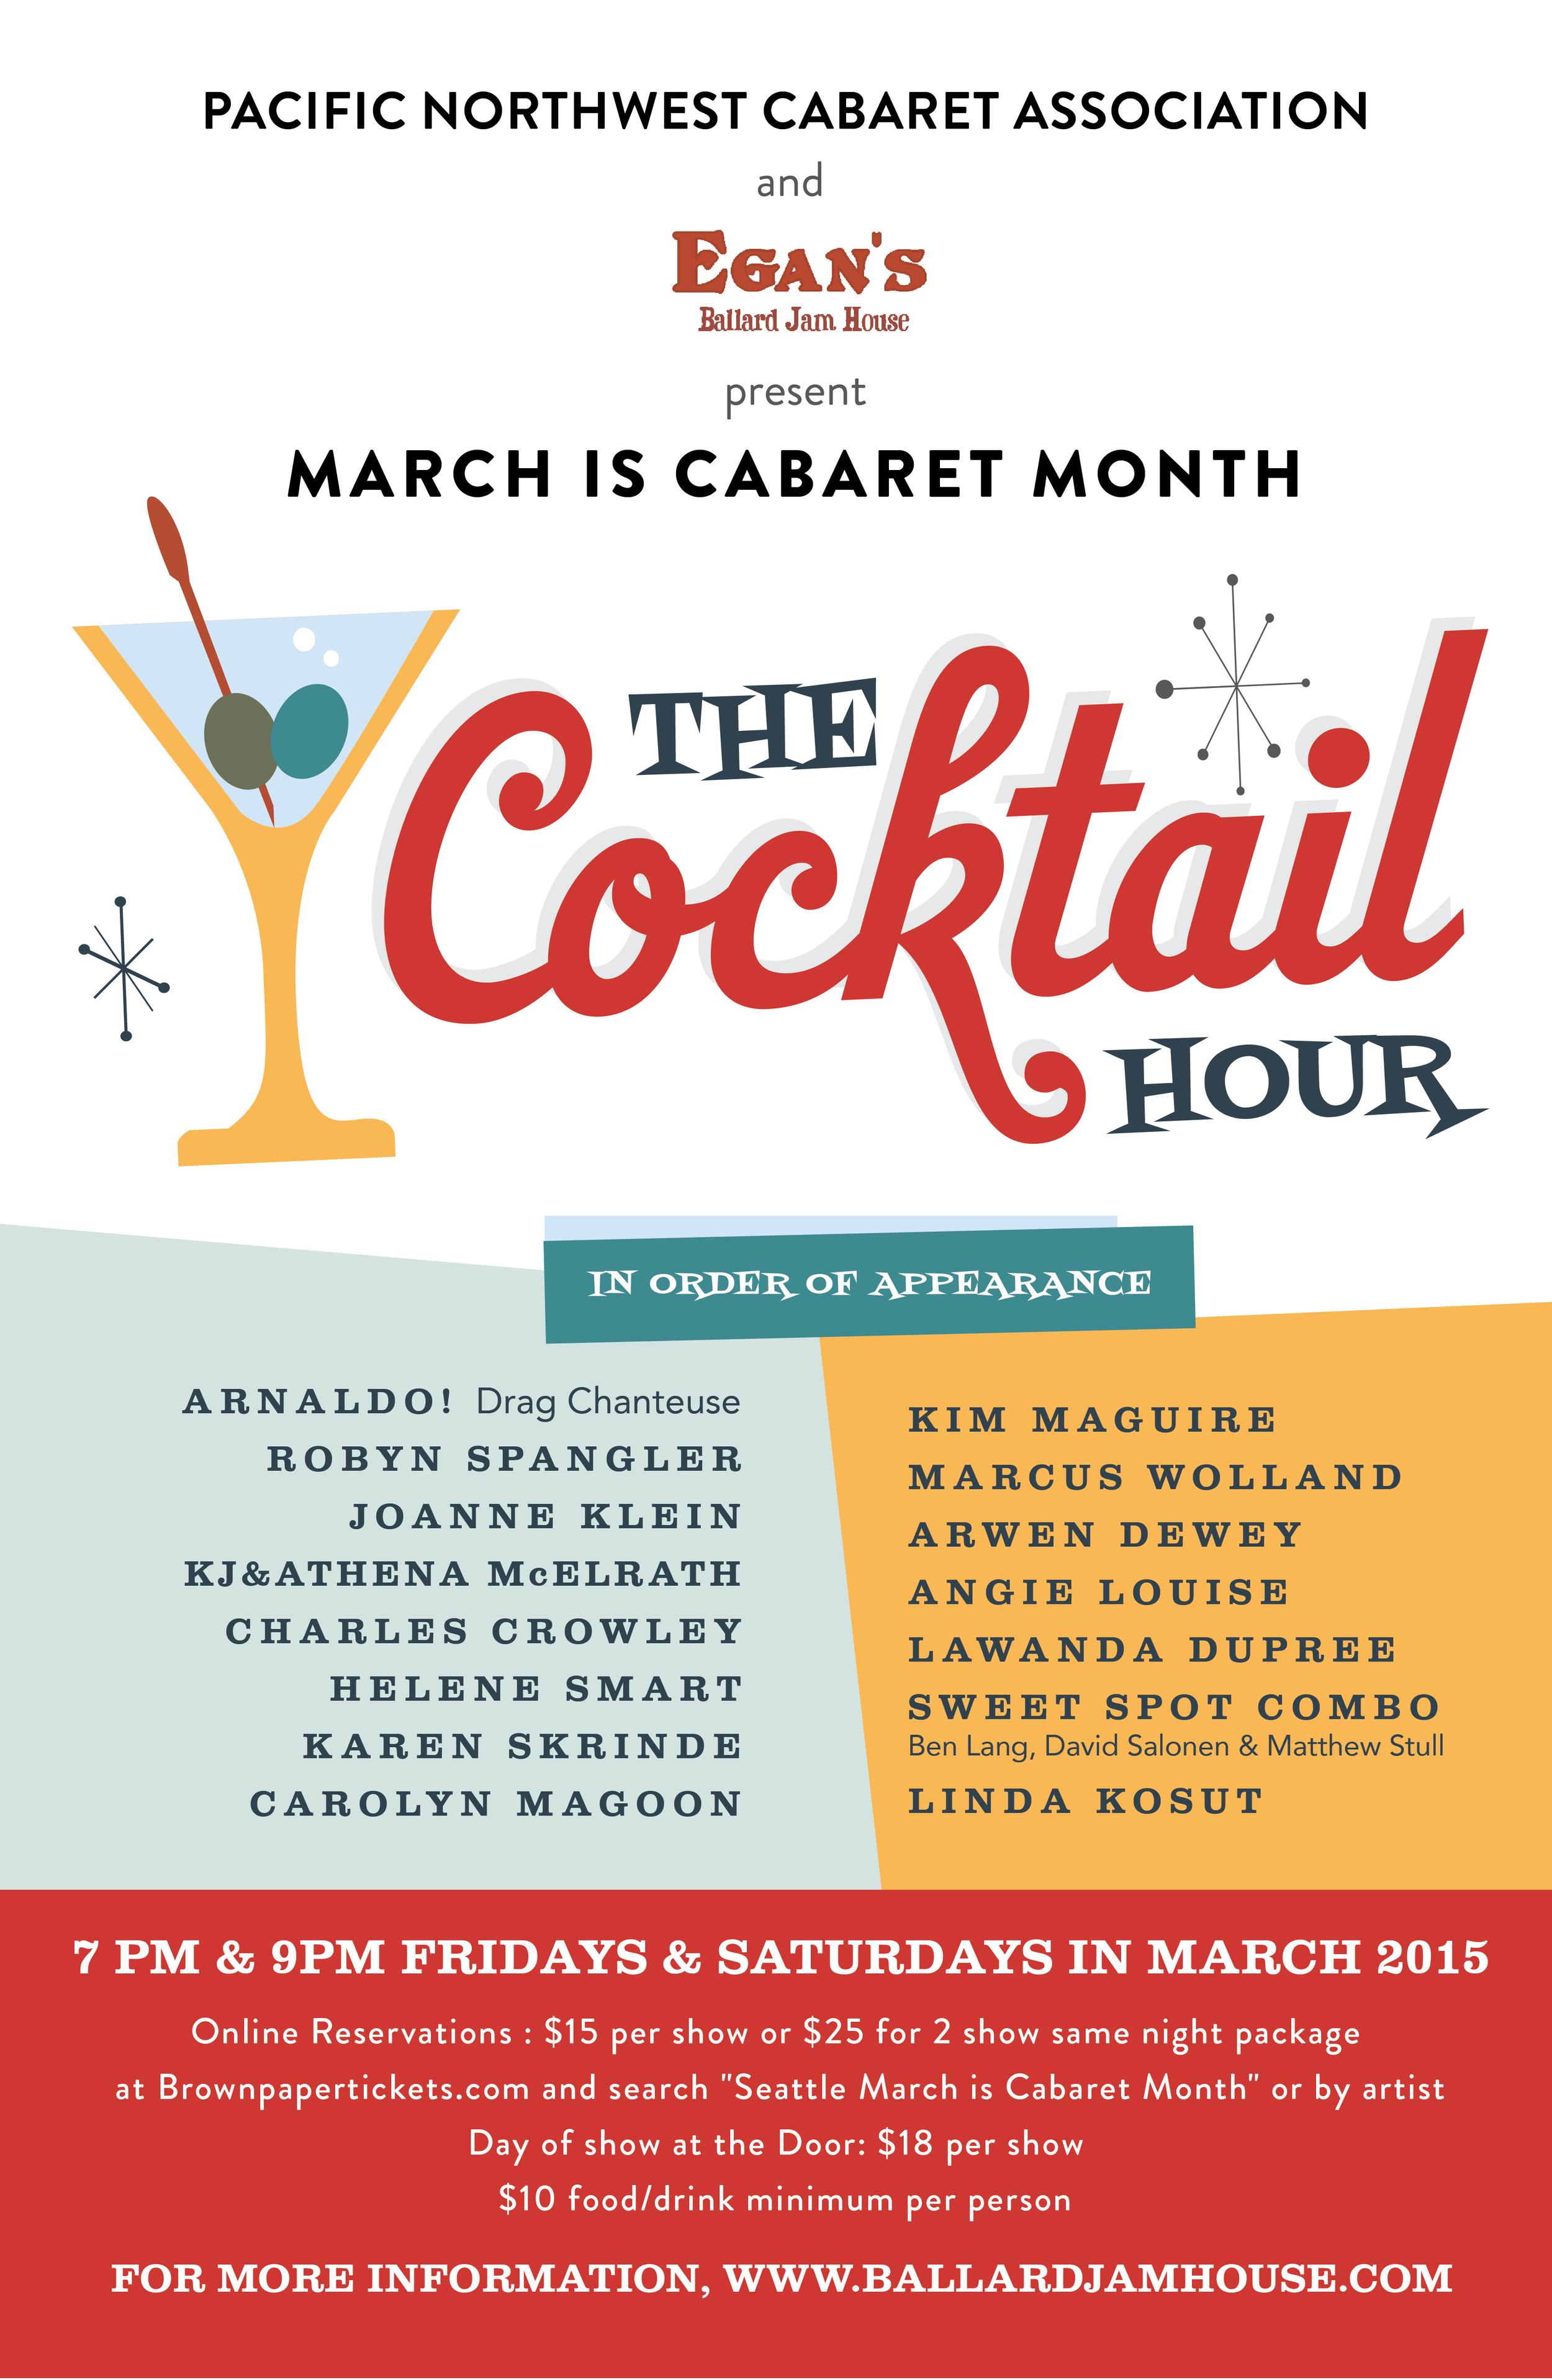 CocktailHour_v4-01_FINAL.png